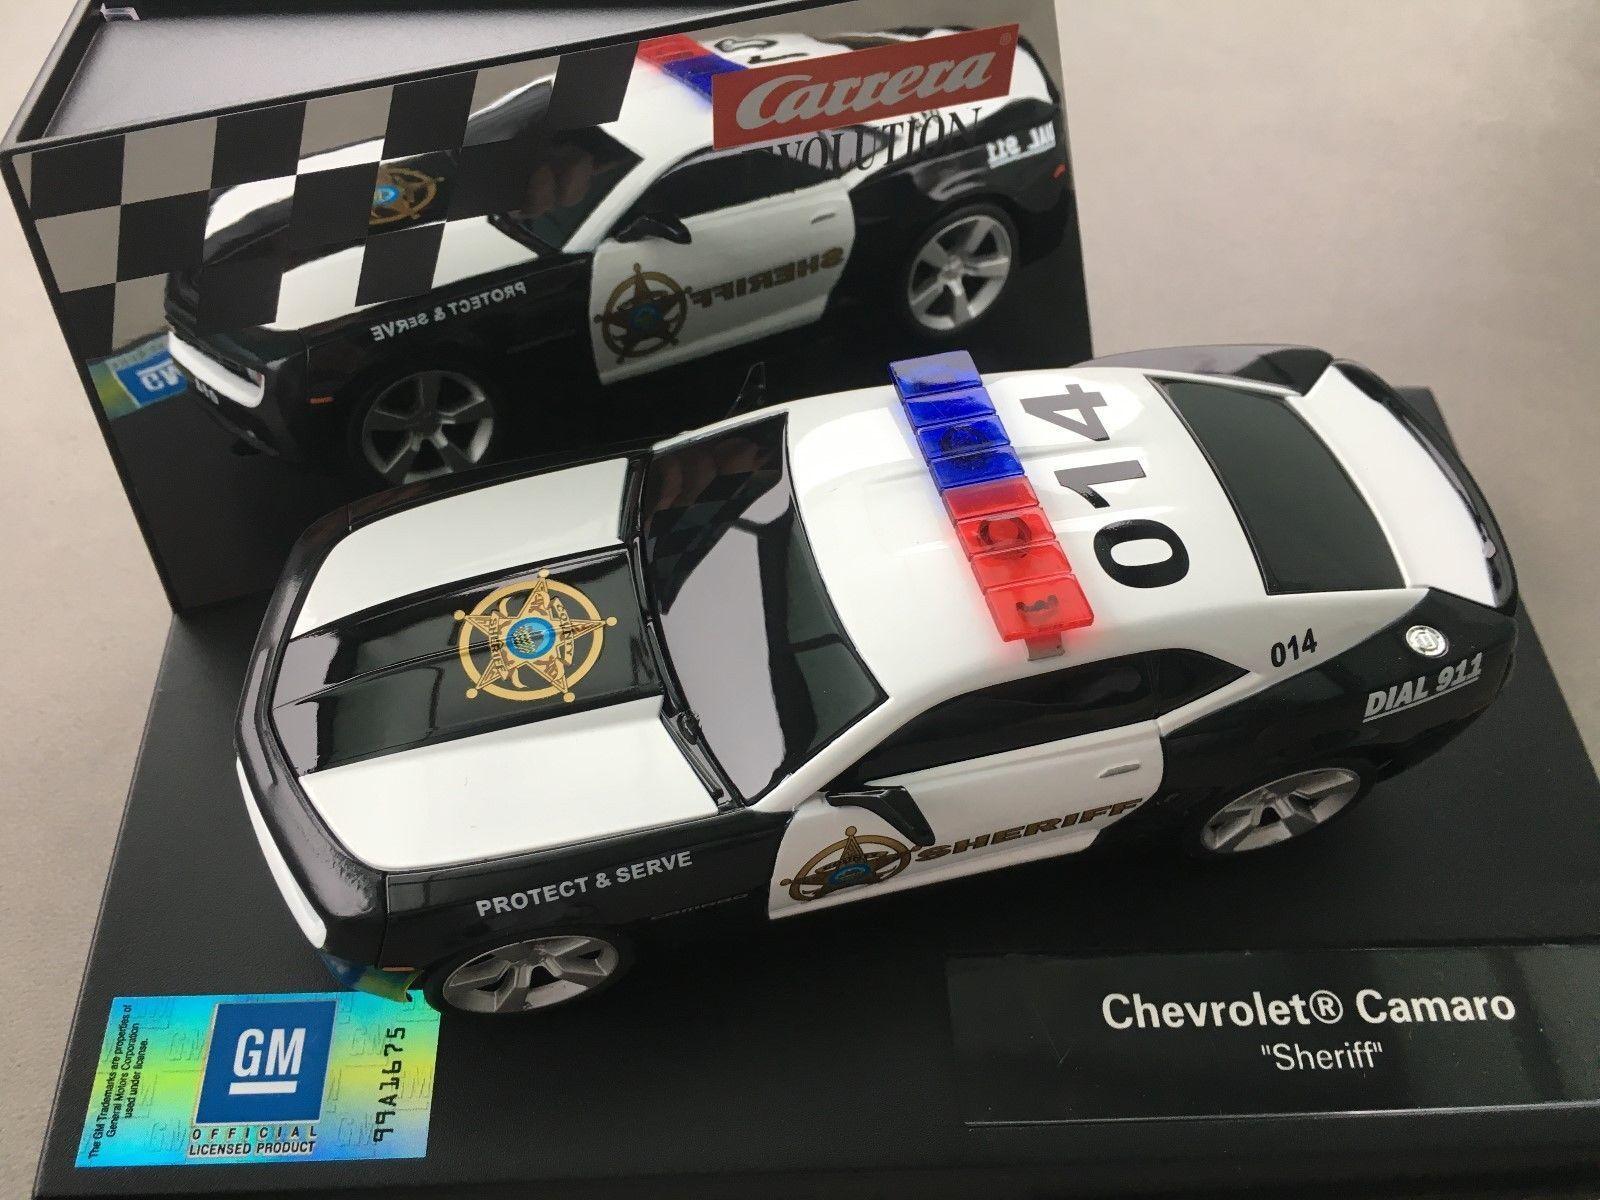 Carrera 1 32 ref. 27523 CAR SHERIFF CHEVROLET CAMARO NEW NEW